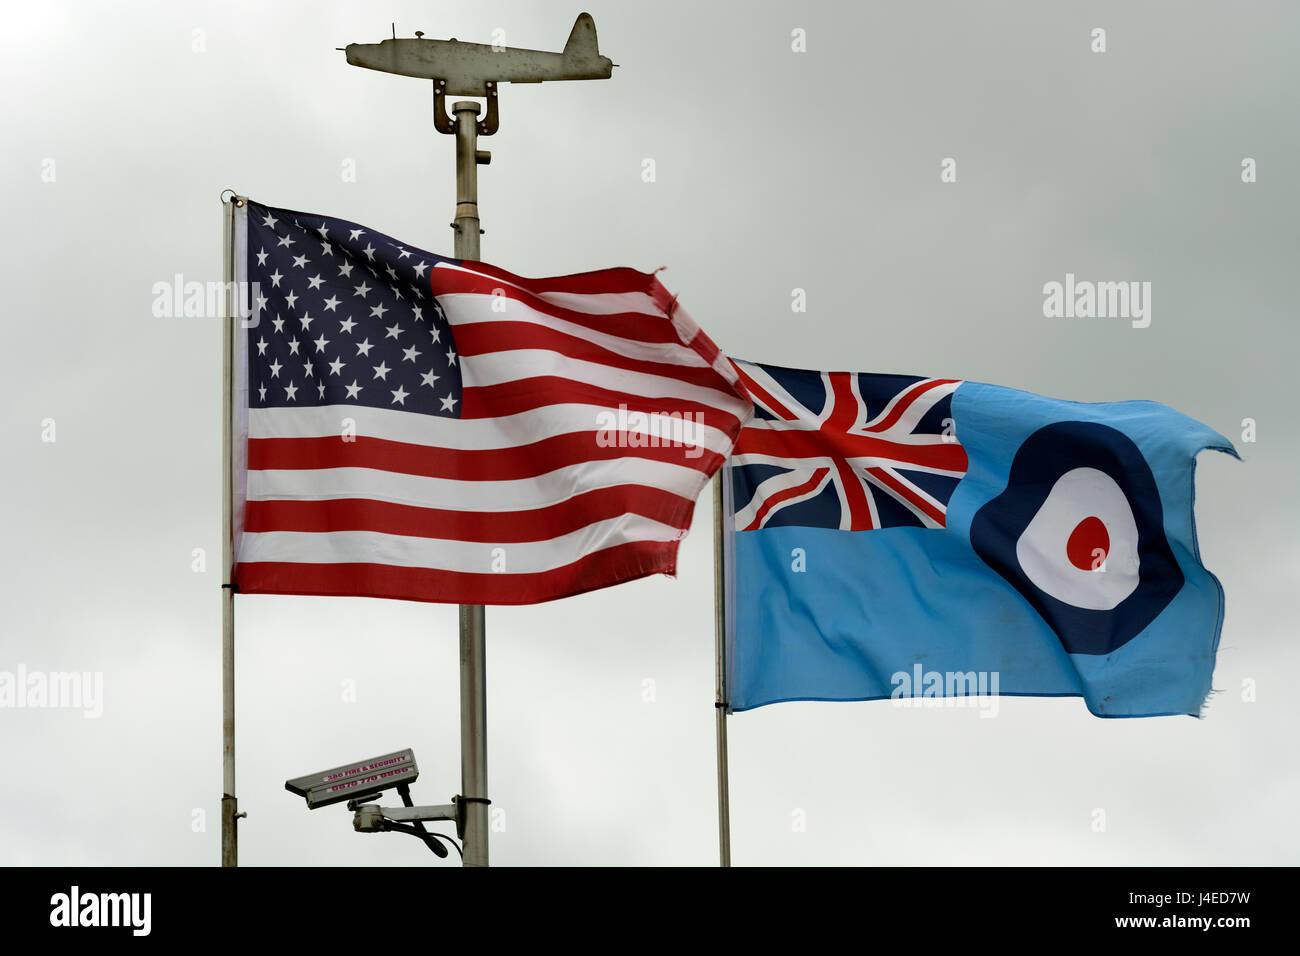 USA and RAF flags at Sywell Aerodrome museum, Northamptonshire, England, UK - Stock Image